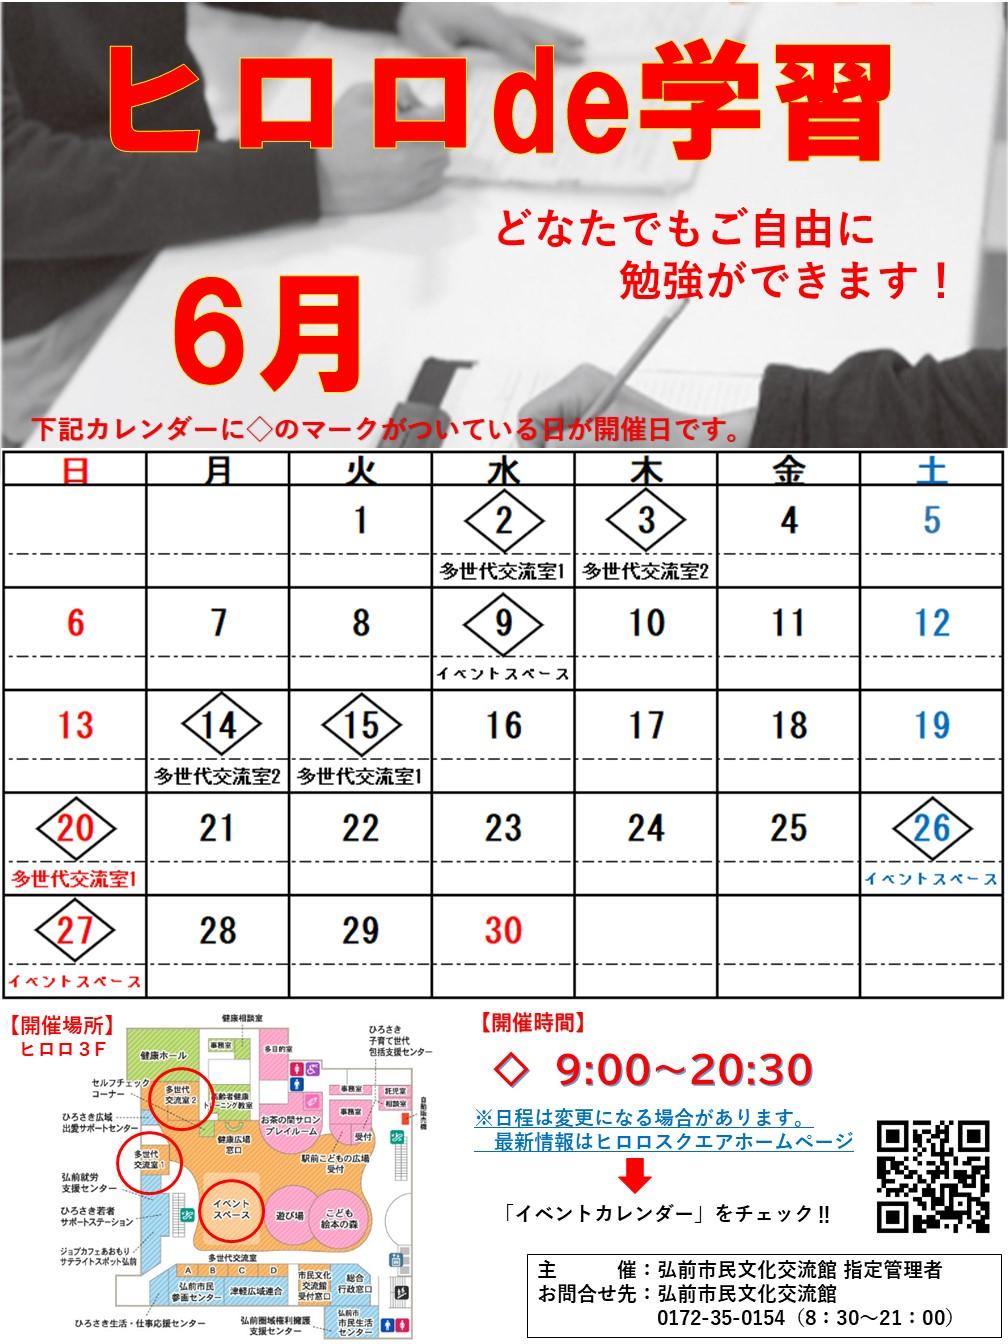 「ヒロロde学習」6月分日程